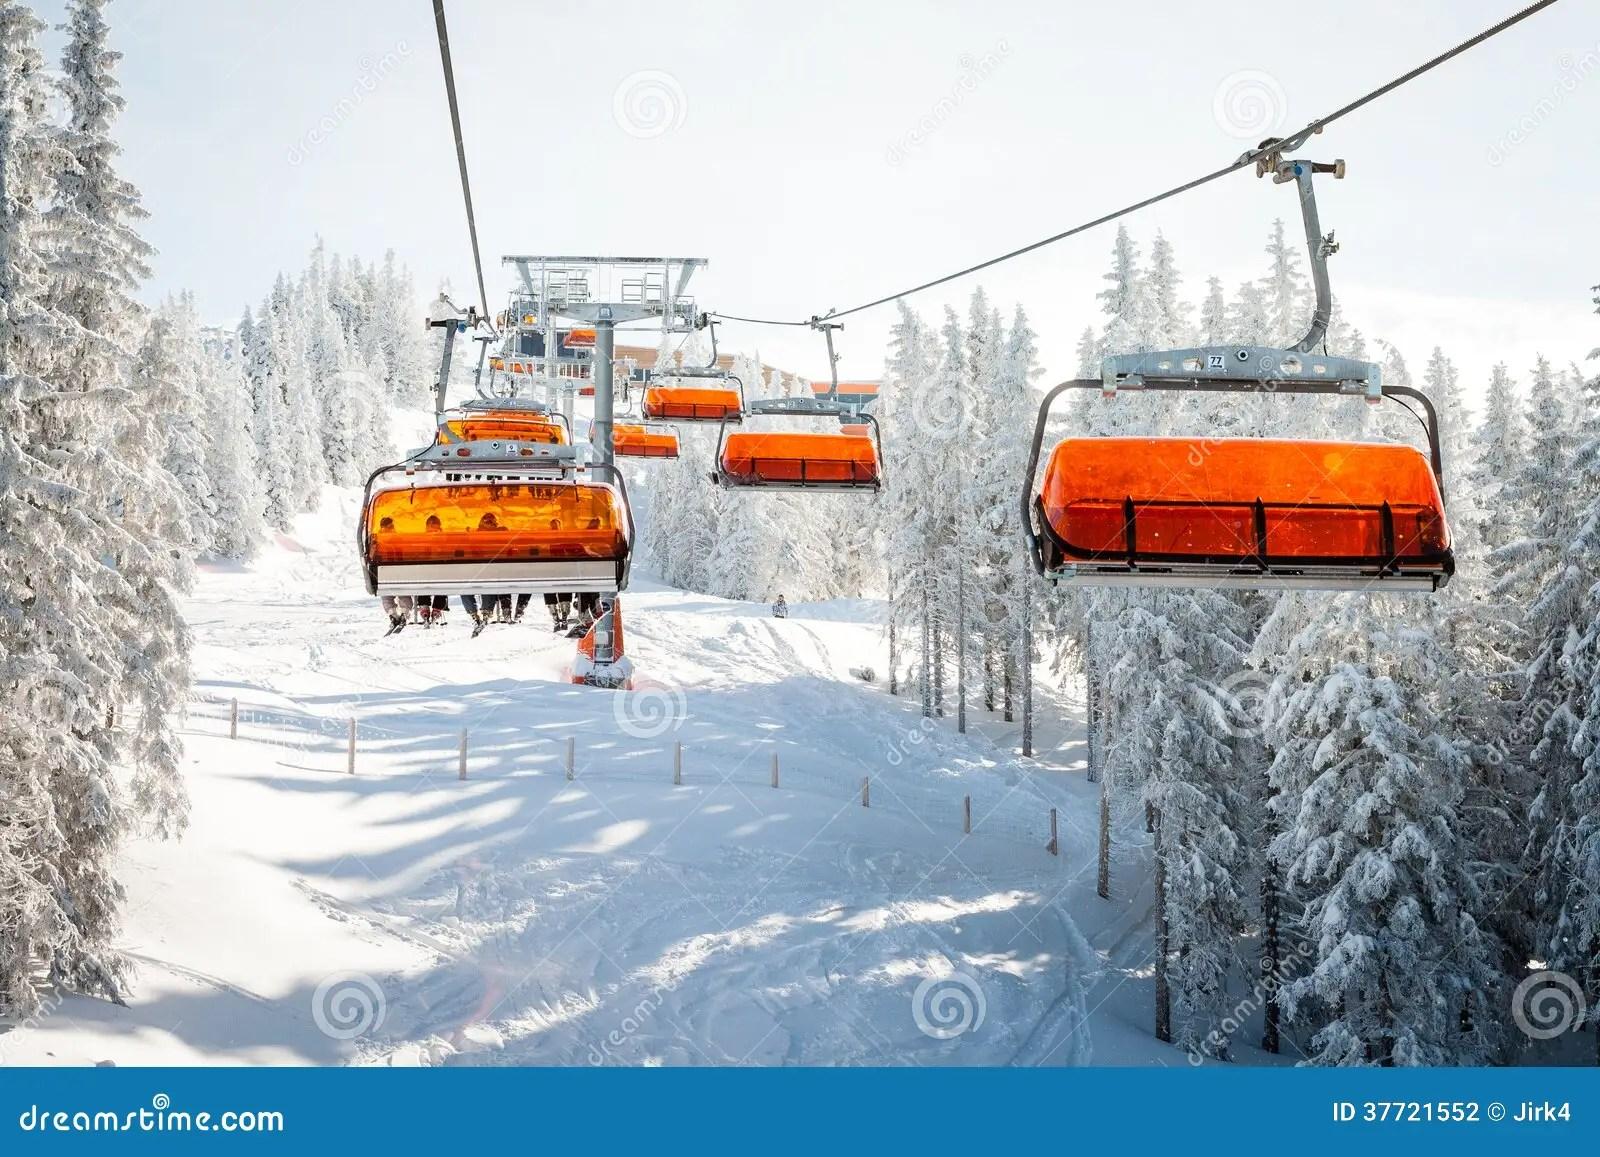 buy ski lift chair office orange stock photo cartoondealer 86132682